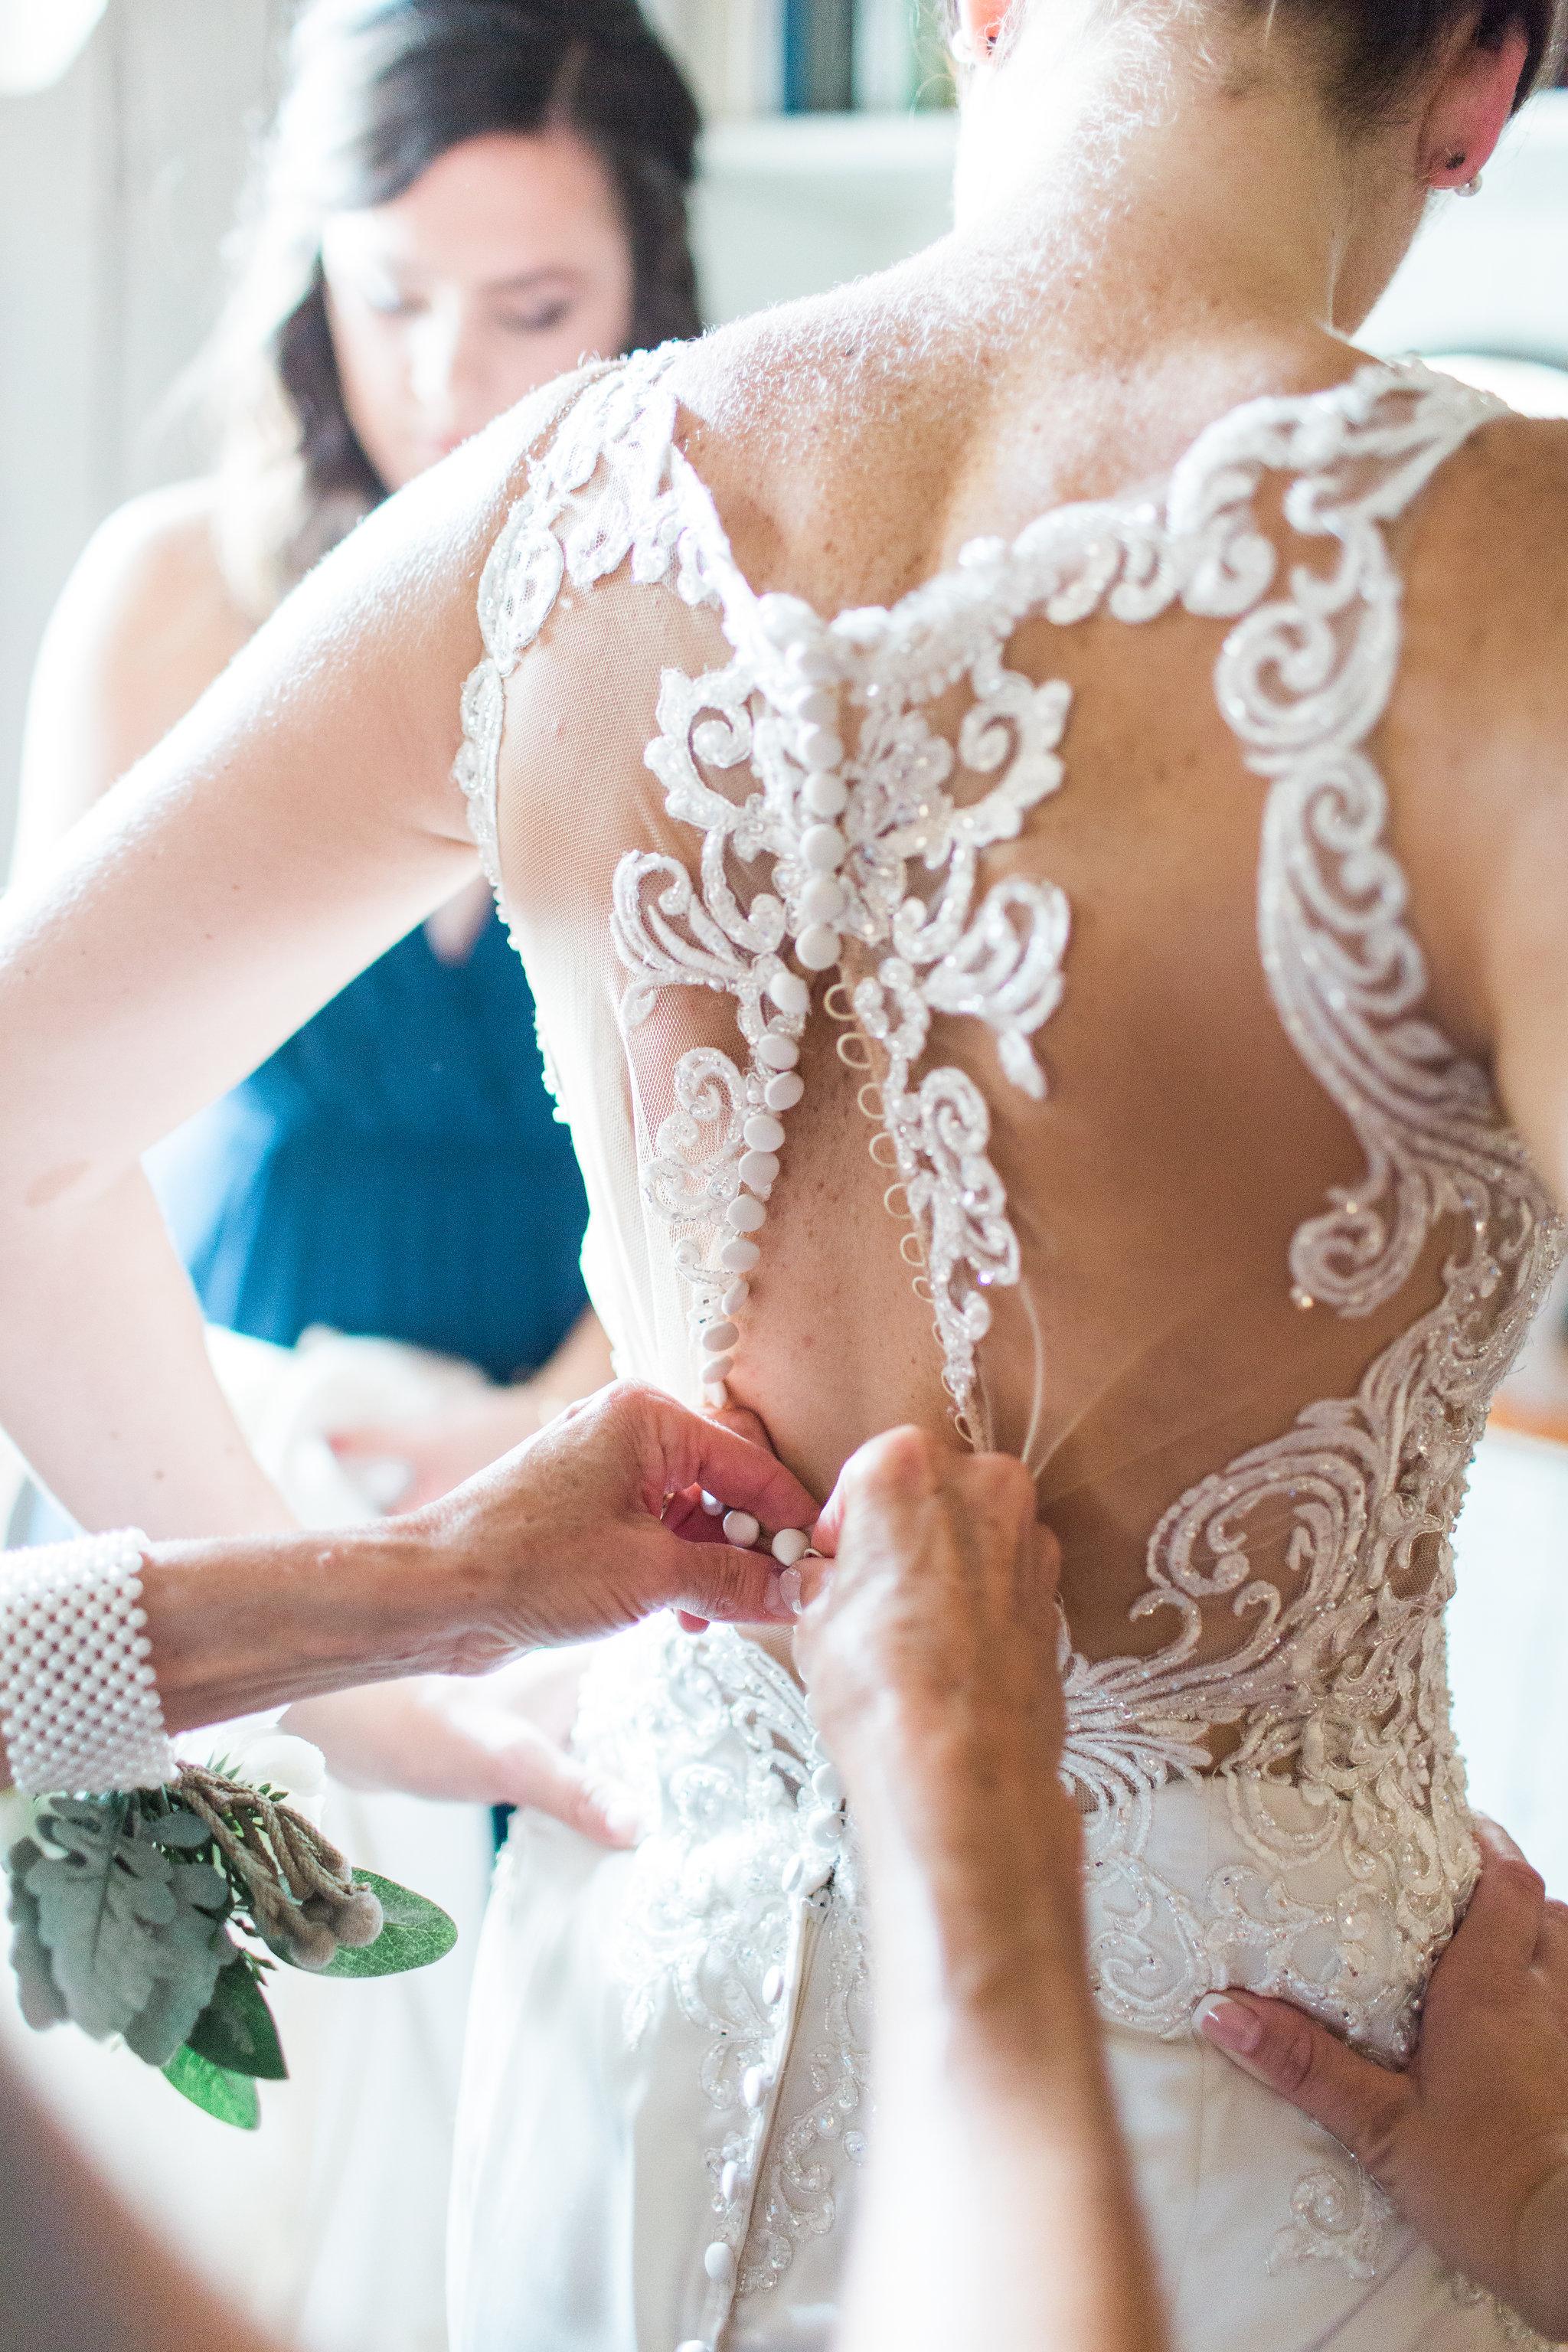 apt-b-photography-lauren-graham-oldfield-wedding-south-carolina-wedding-photographer-savannah-wedding-lowcountry-wedding-coastal-wedding-stella-york-wedding-dress-illusion-back-5.JPG